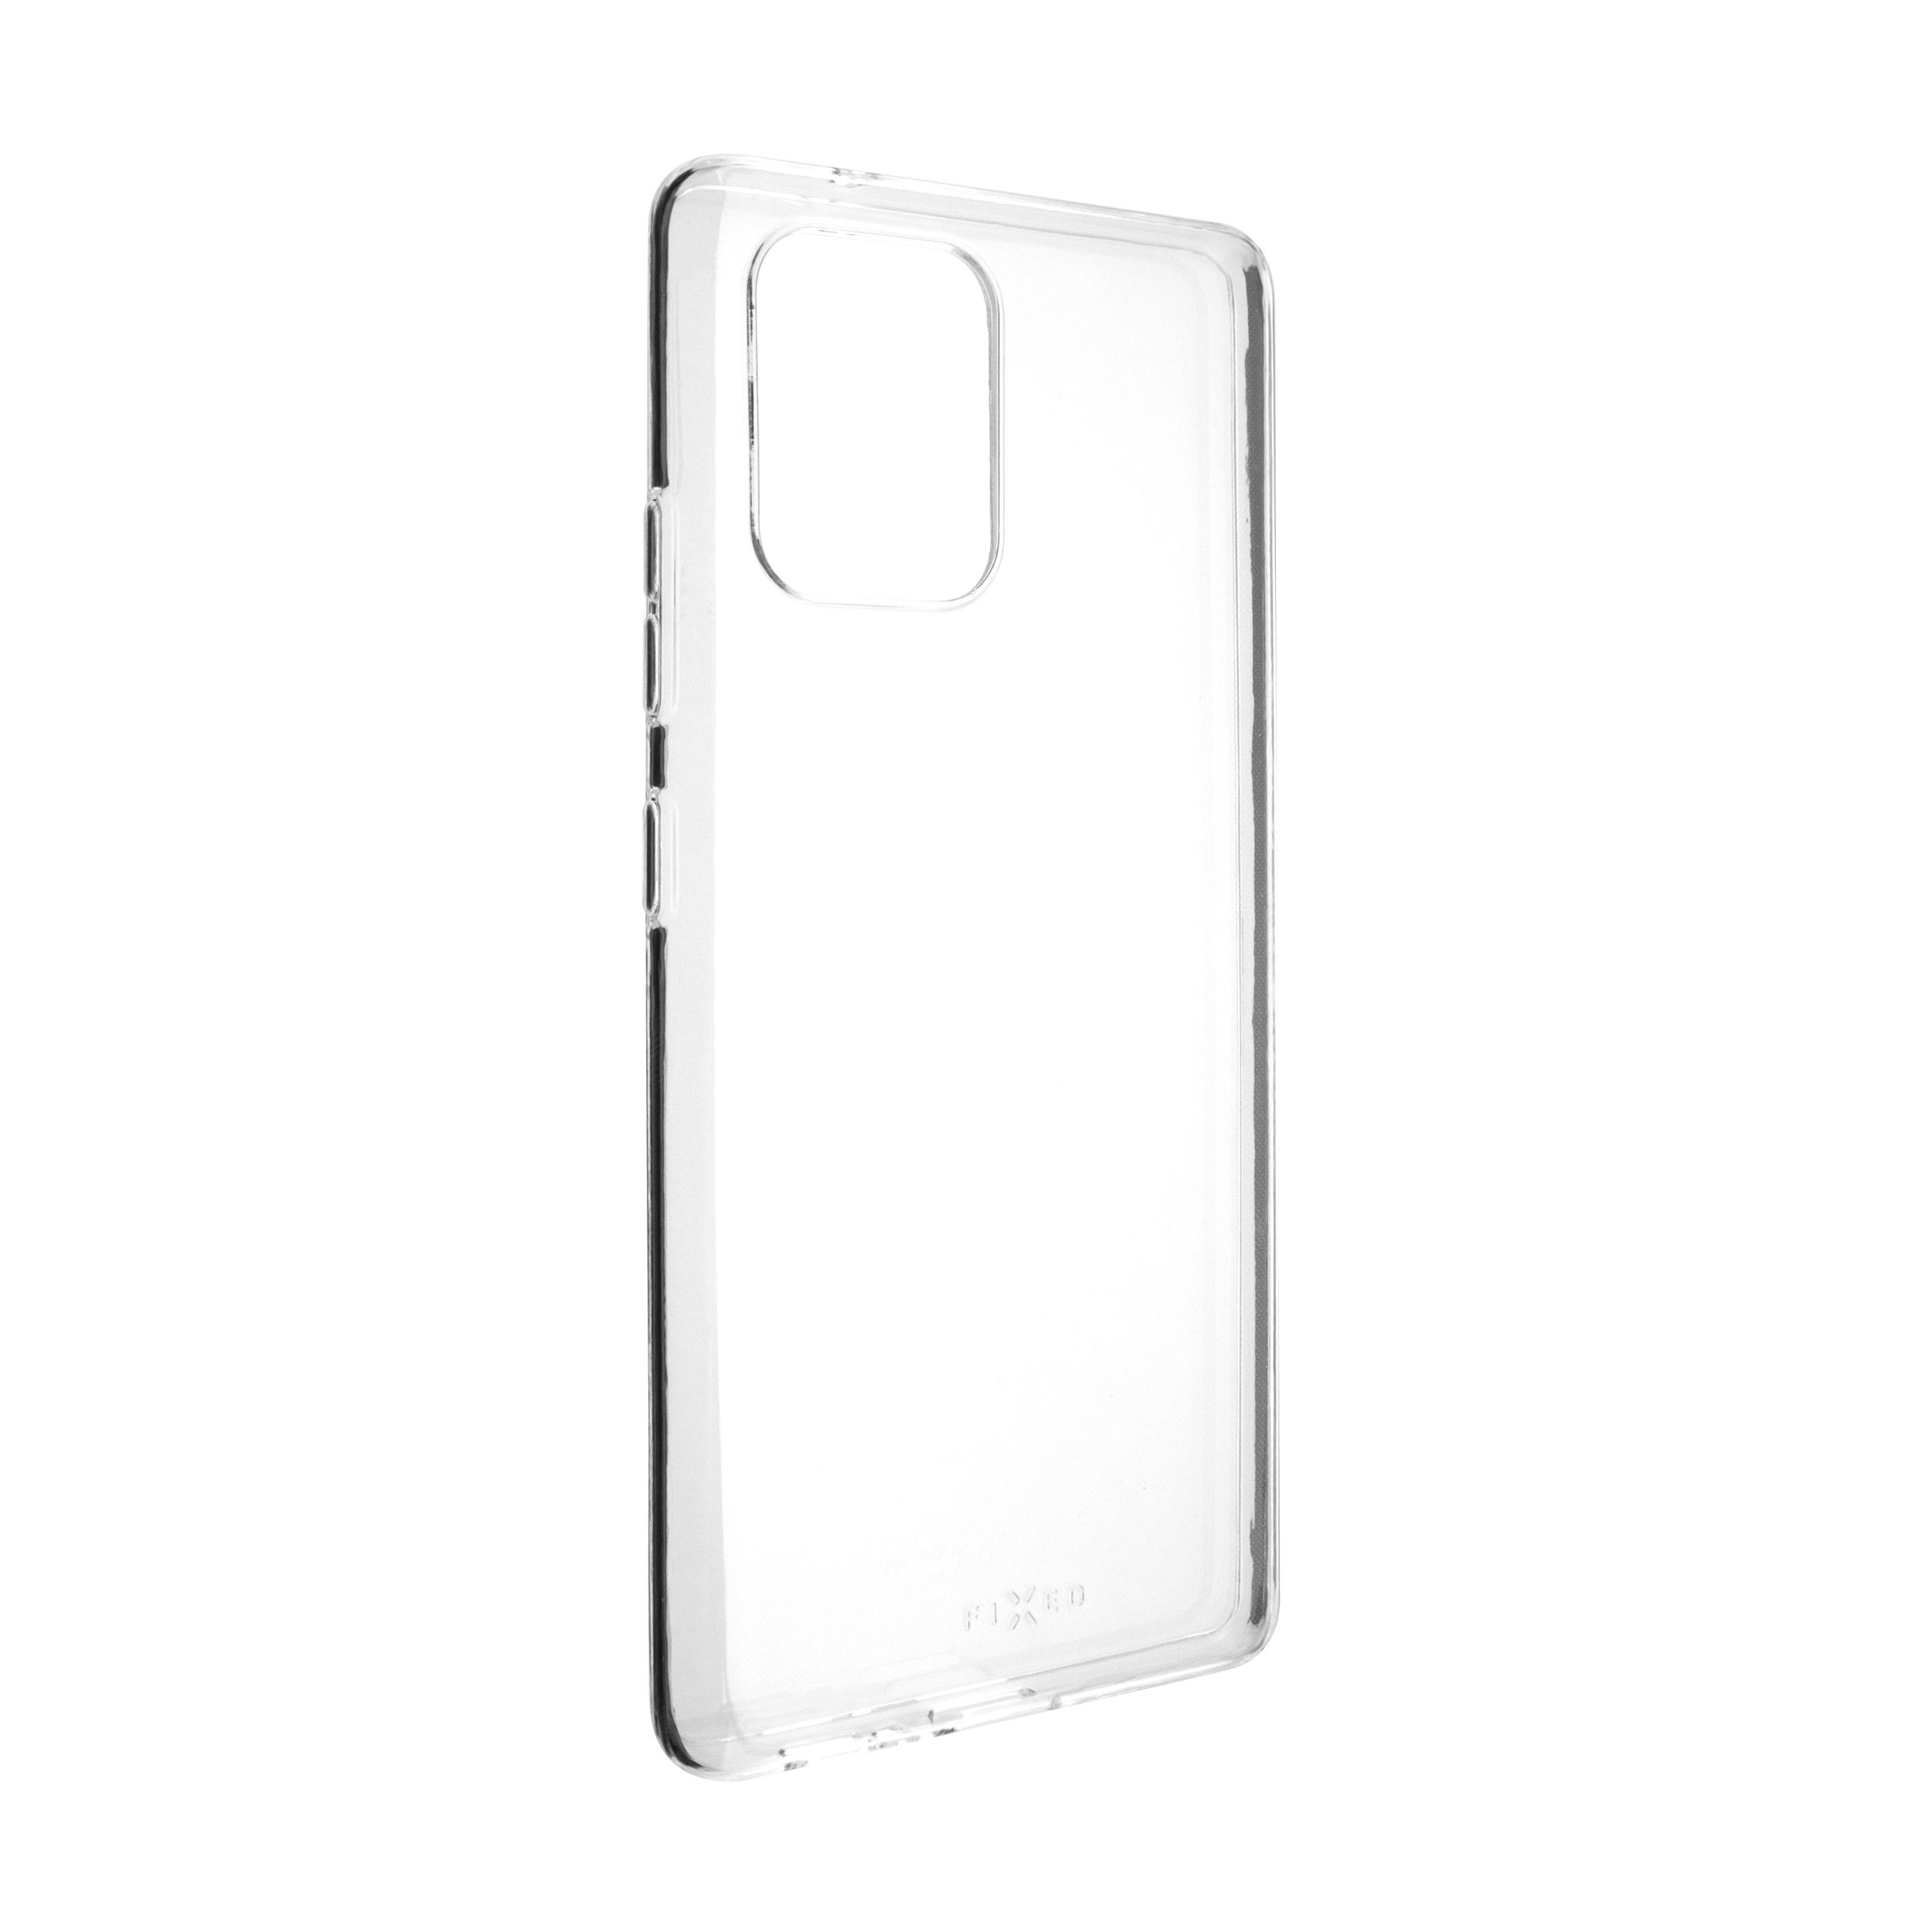 Ultratenké TPU gelové pouzdro FIXED Skin pro Samsung Galaxy S10 Lite, 0,6 mm, čiré